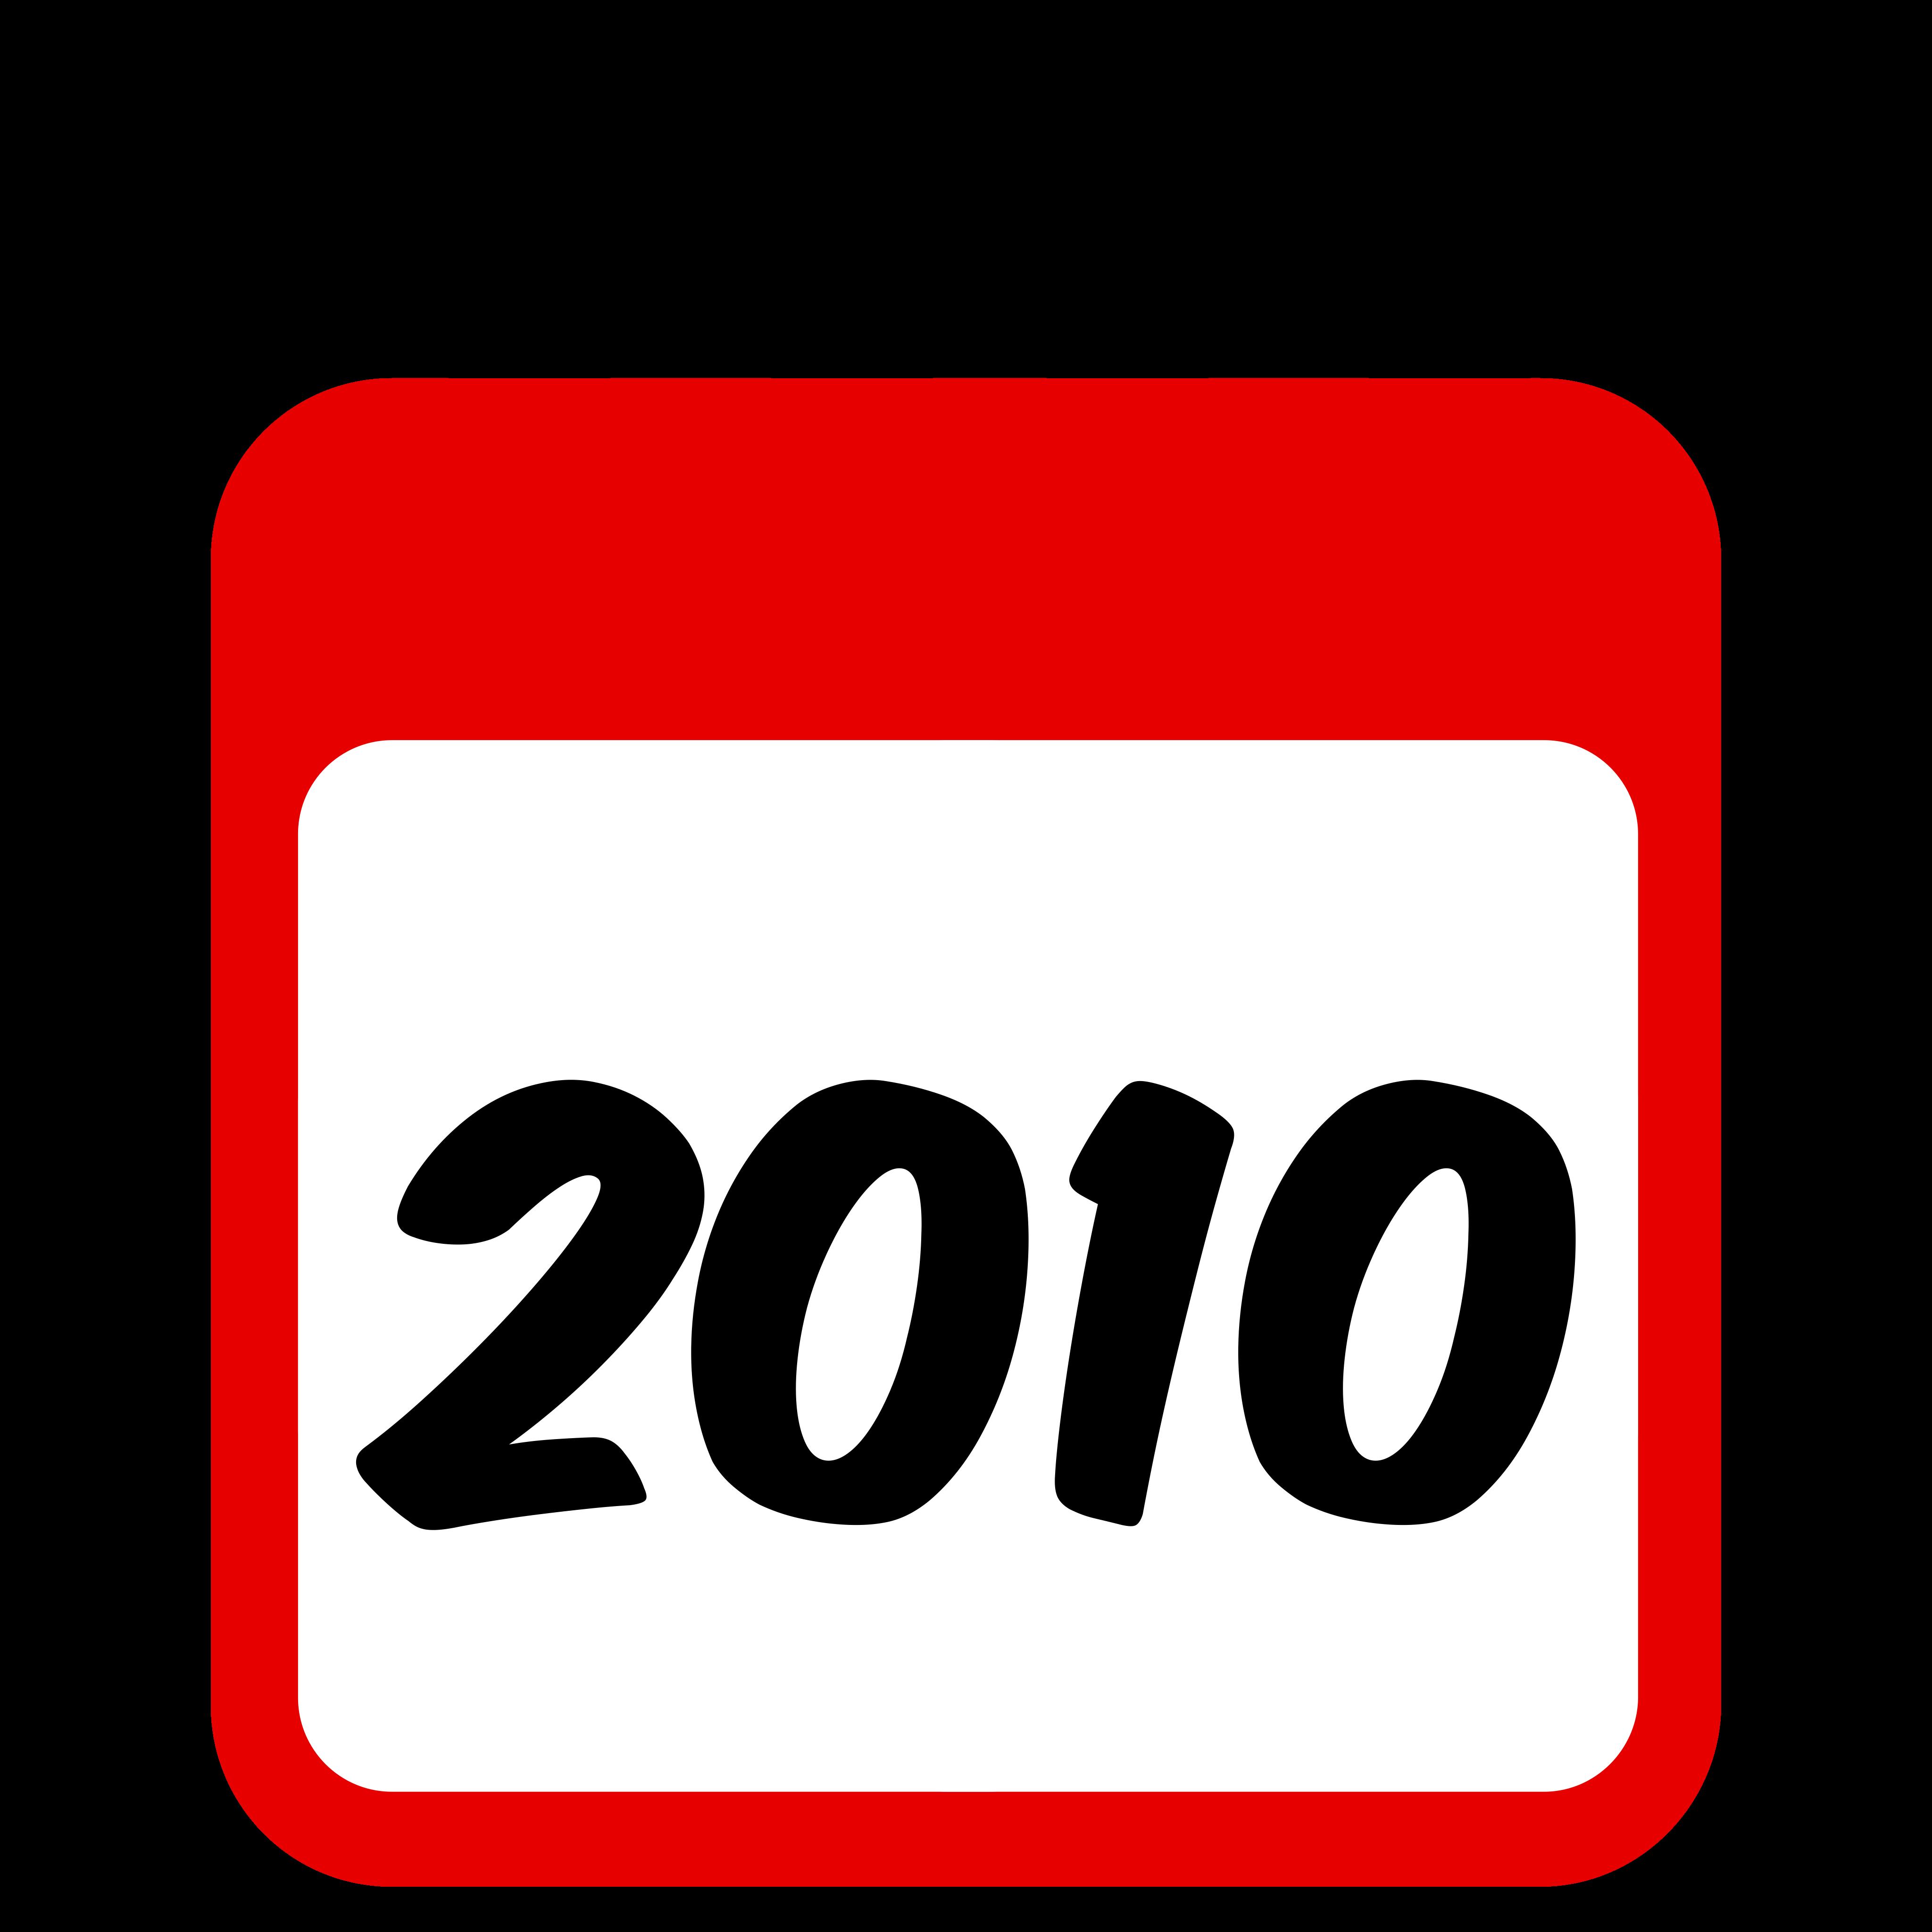 2010 Calendar Graphic